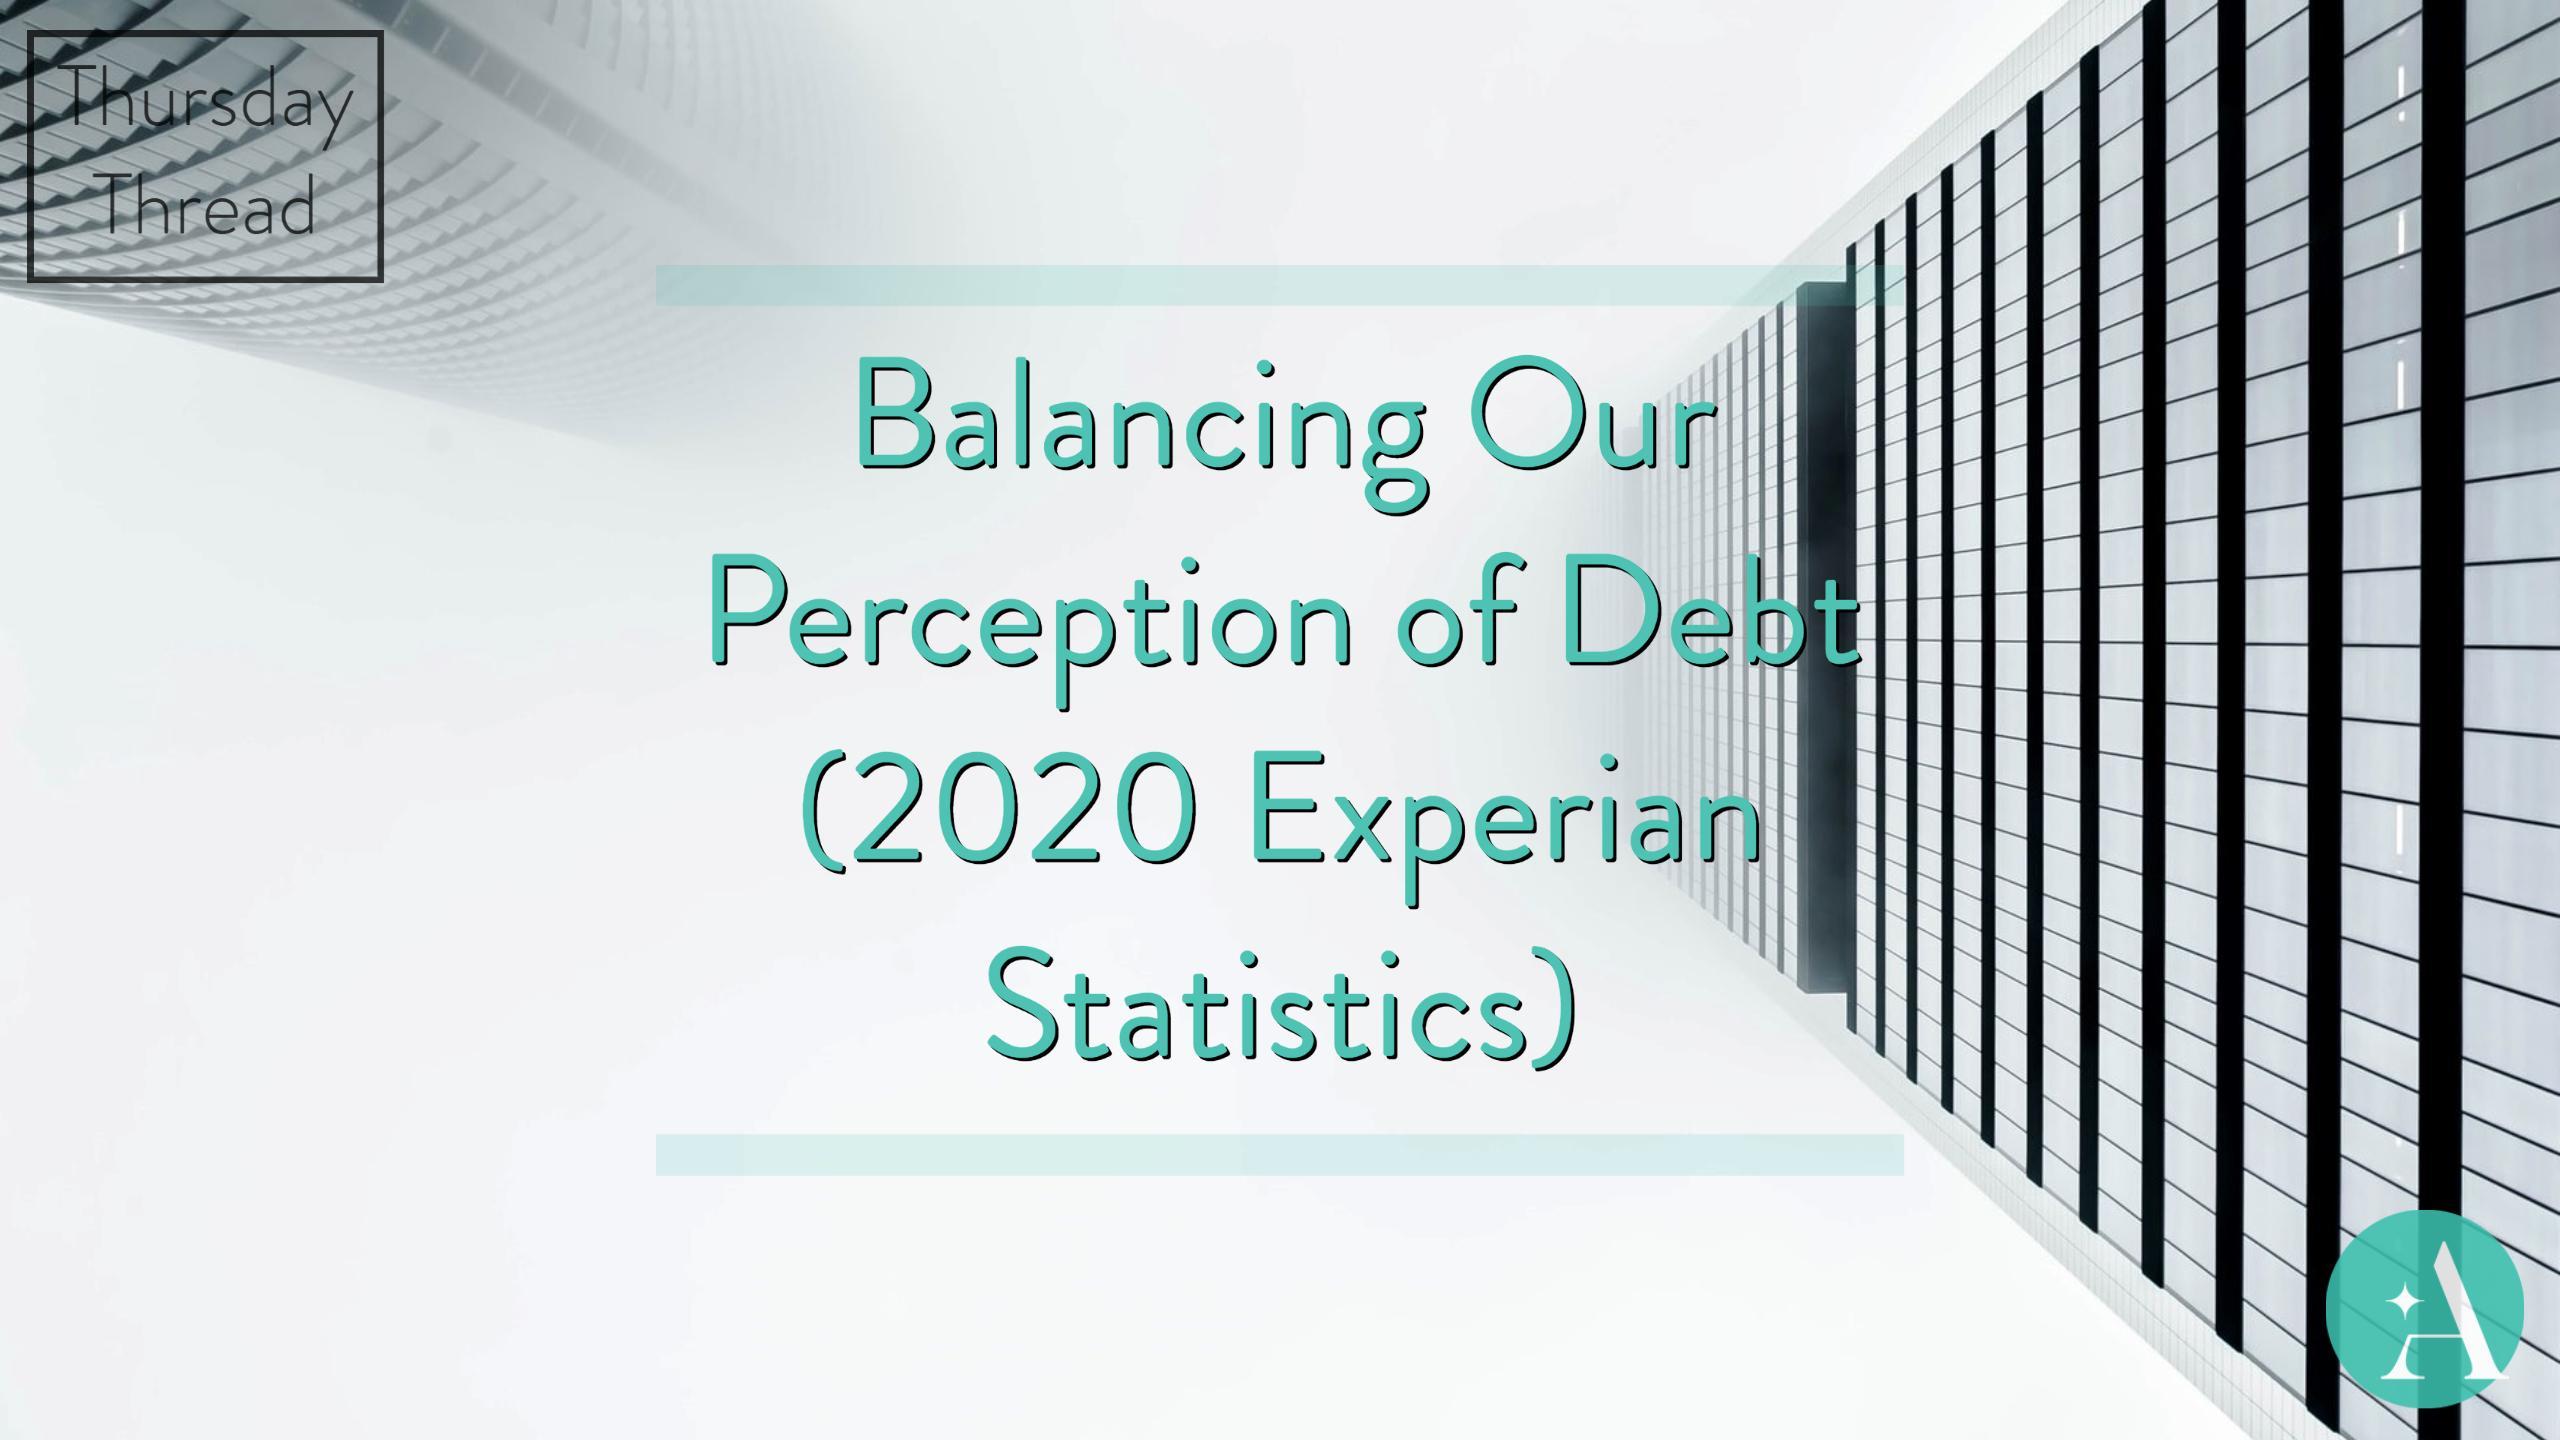 Thursday Thread: Balancing Our Perception of Debt (2020 Experian Statistics) Thumbnail